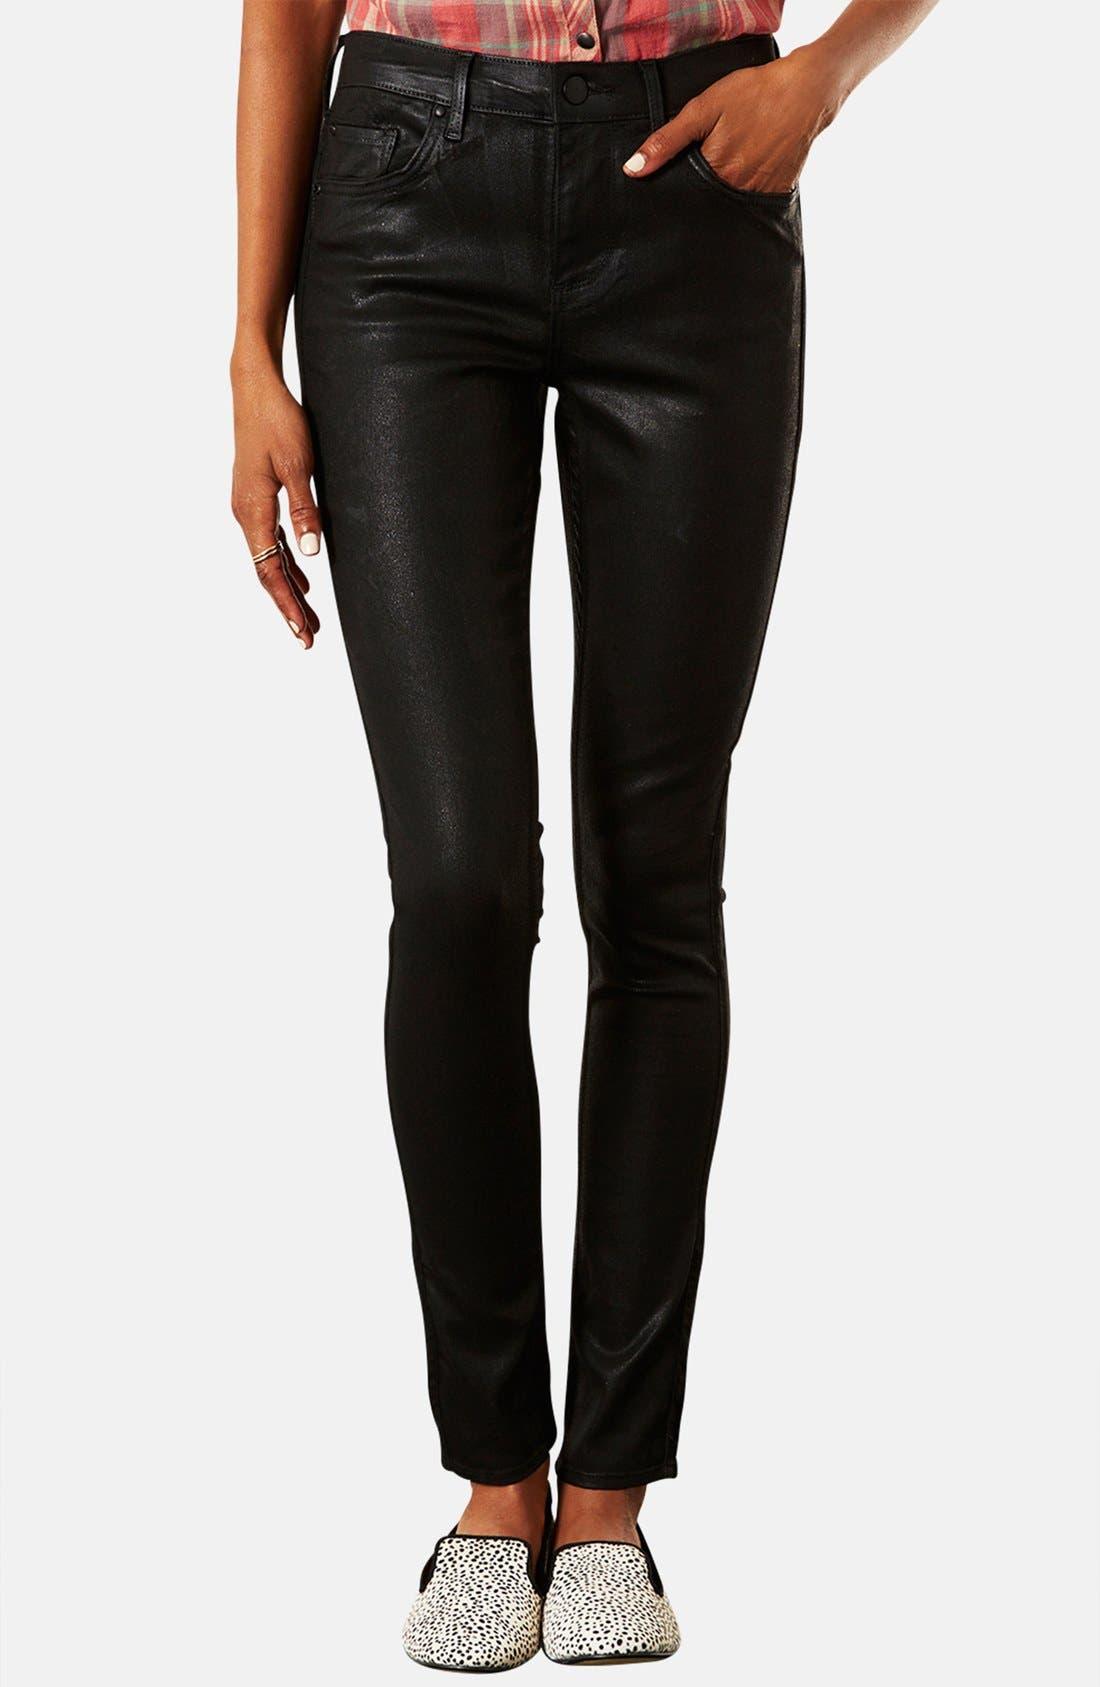 Alternate Image 1 Selected - Topshop Moto 'Leigh' Coated Skinny Jeans (Petite)